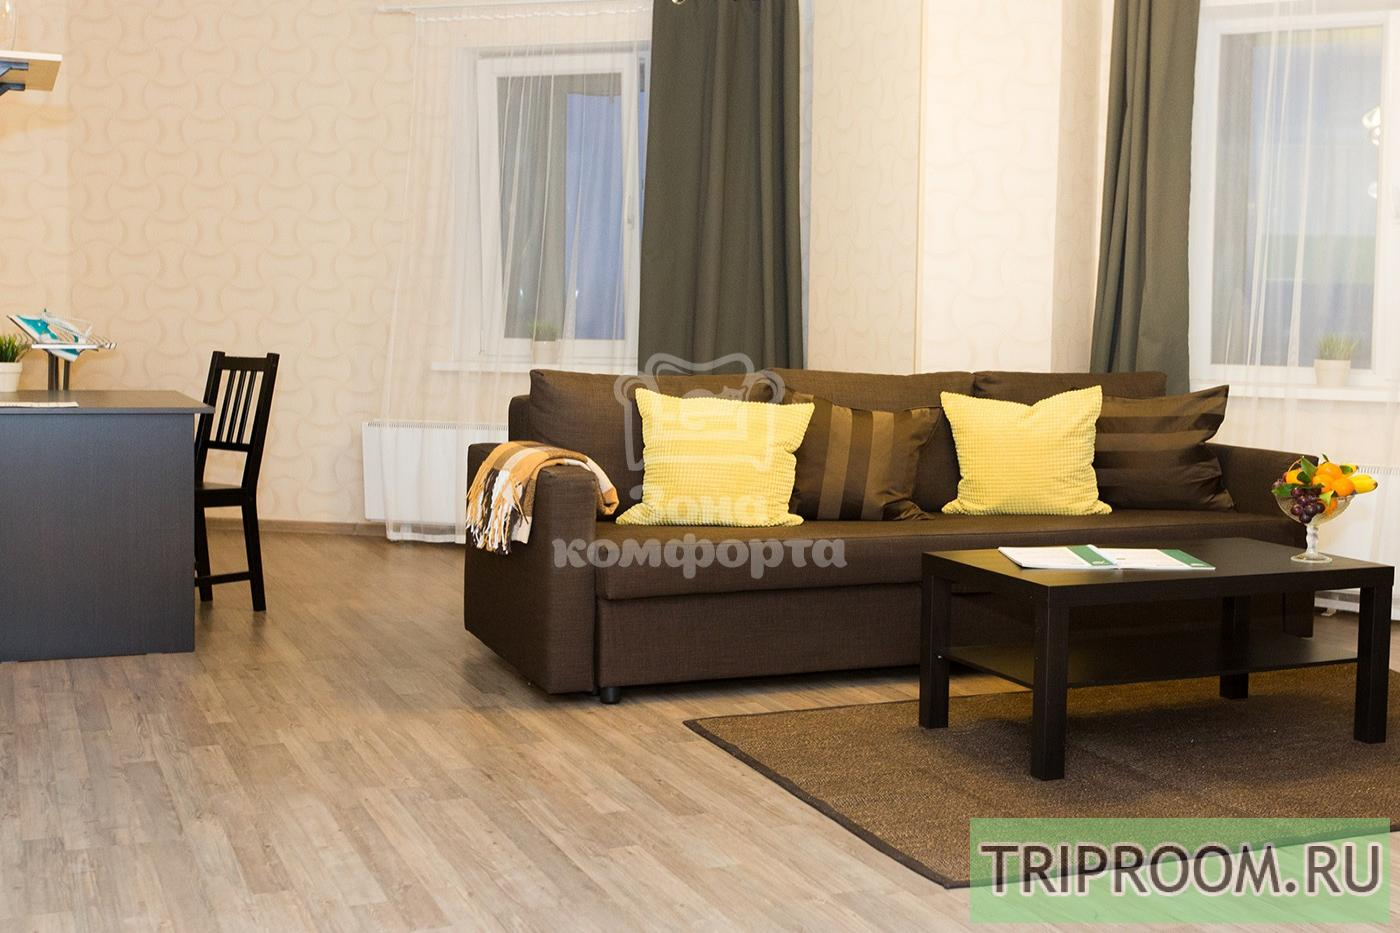 2-комнатная квартира посуточно (вариант № 34715), ул. Гагарина бульвар, фото № 24